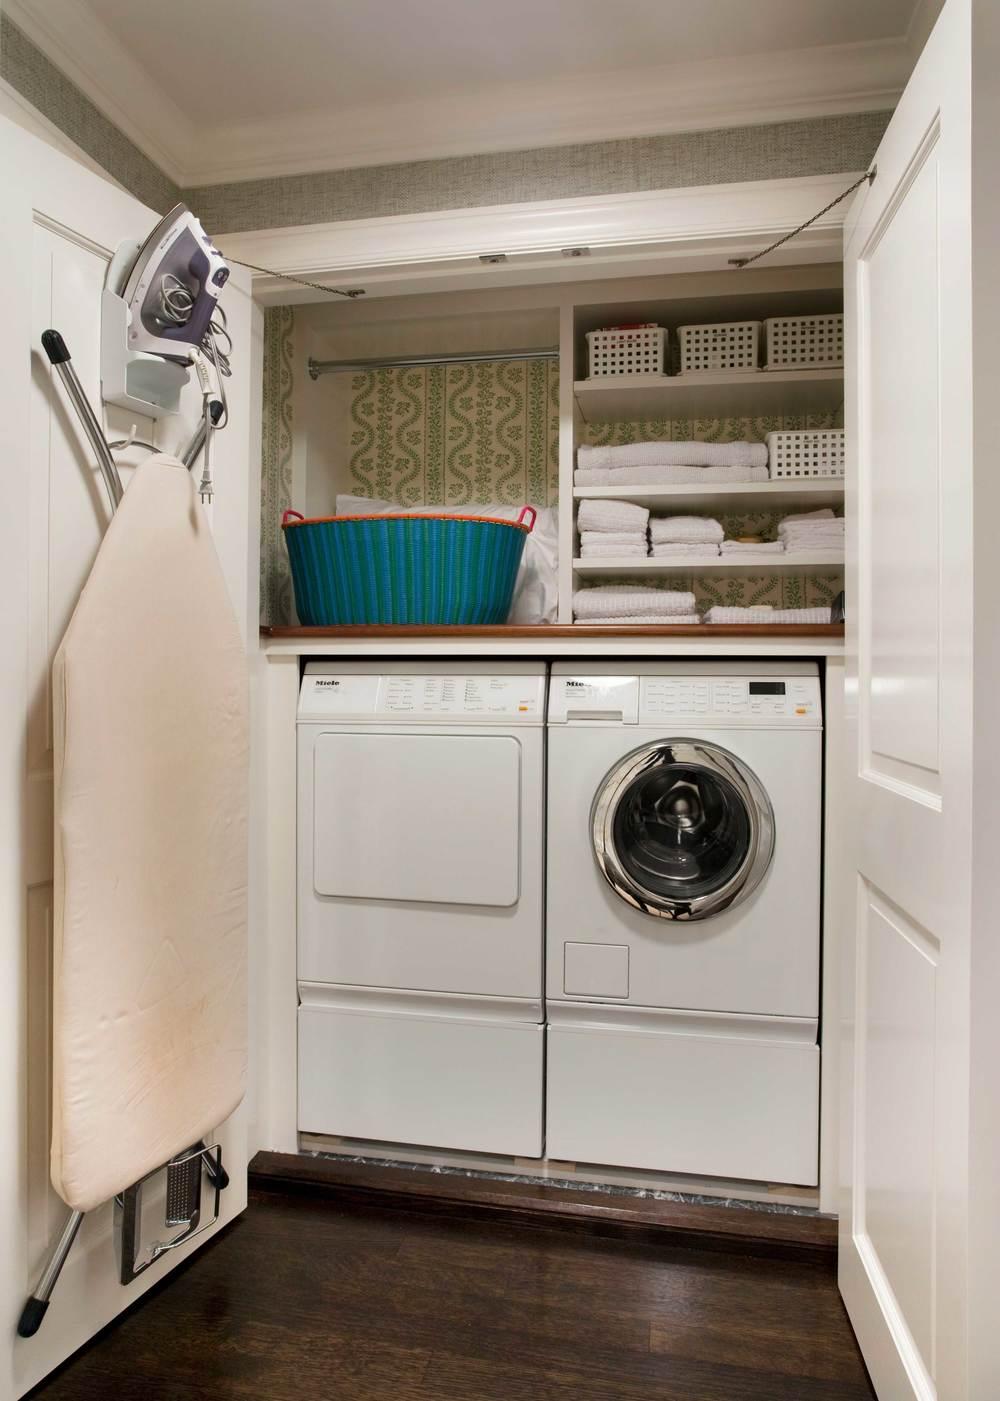 09a-Angus-Beasley-07-11-laundry-room.jpg